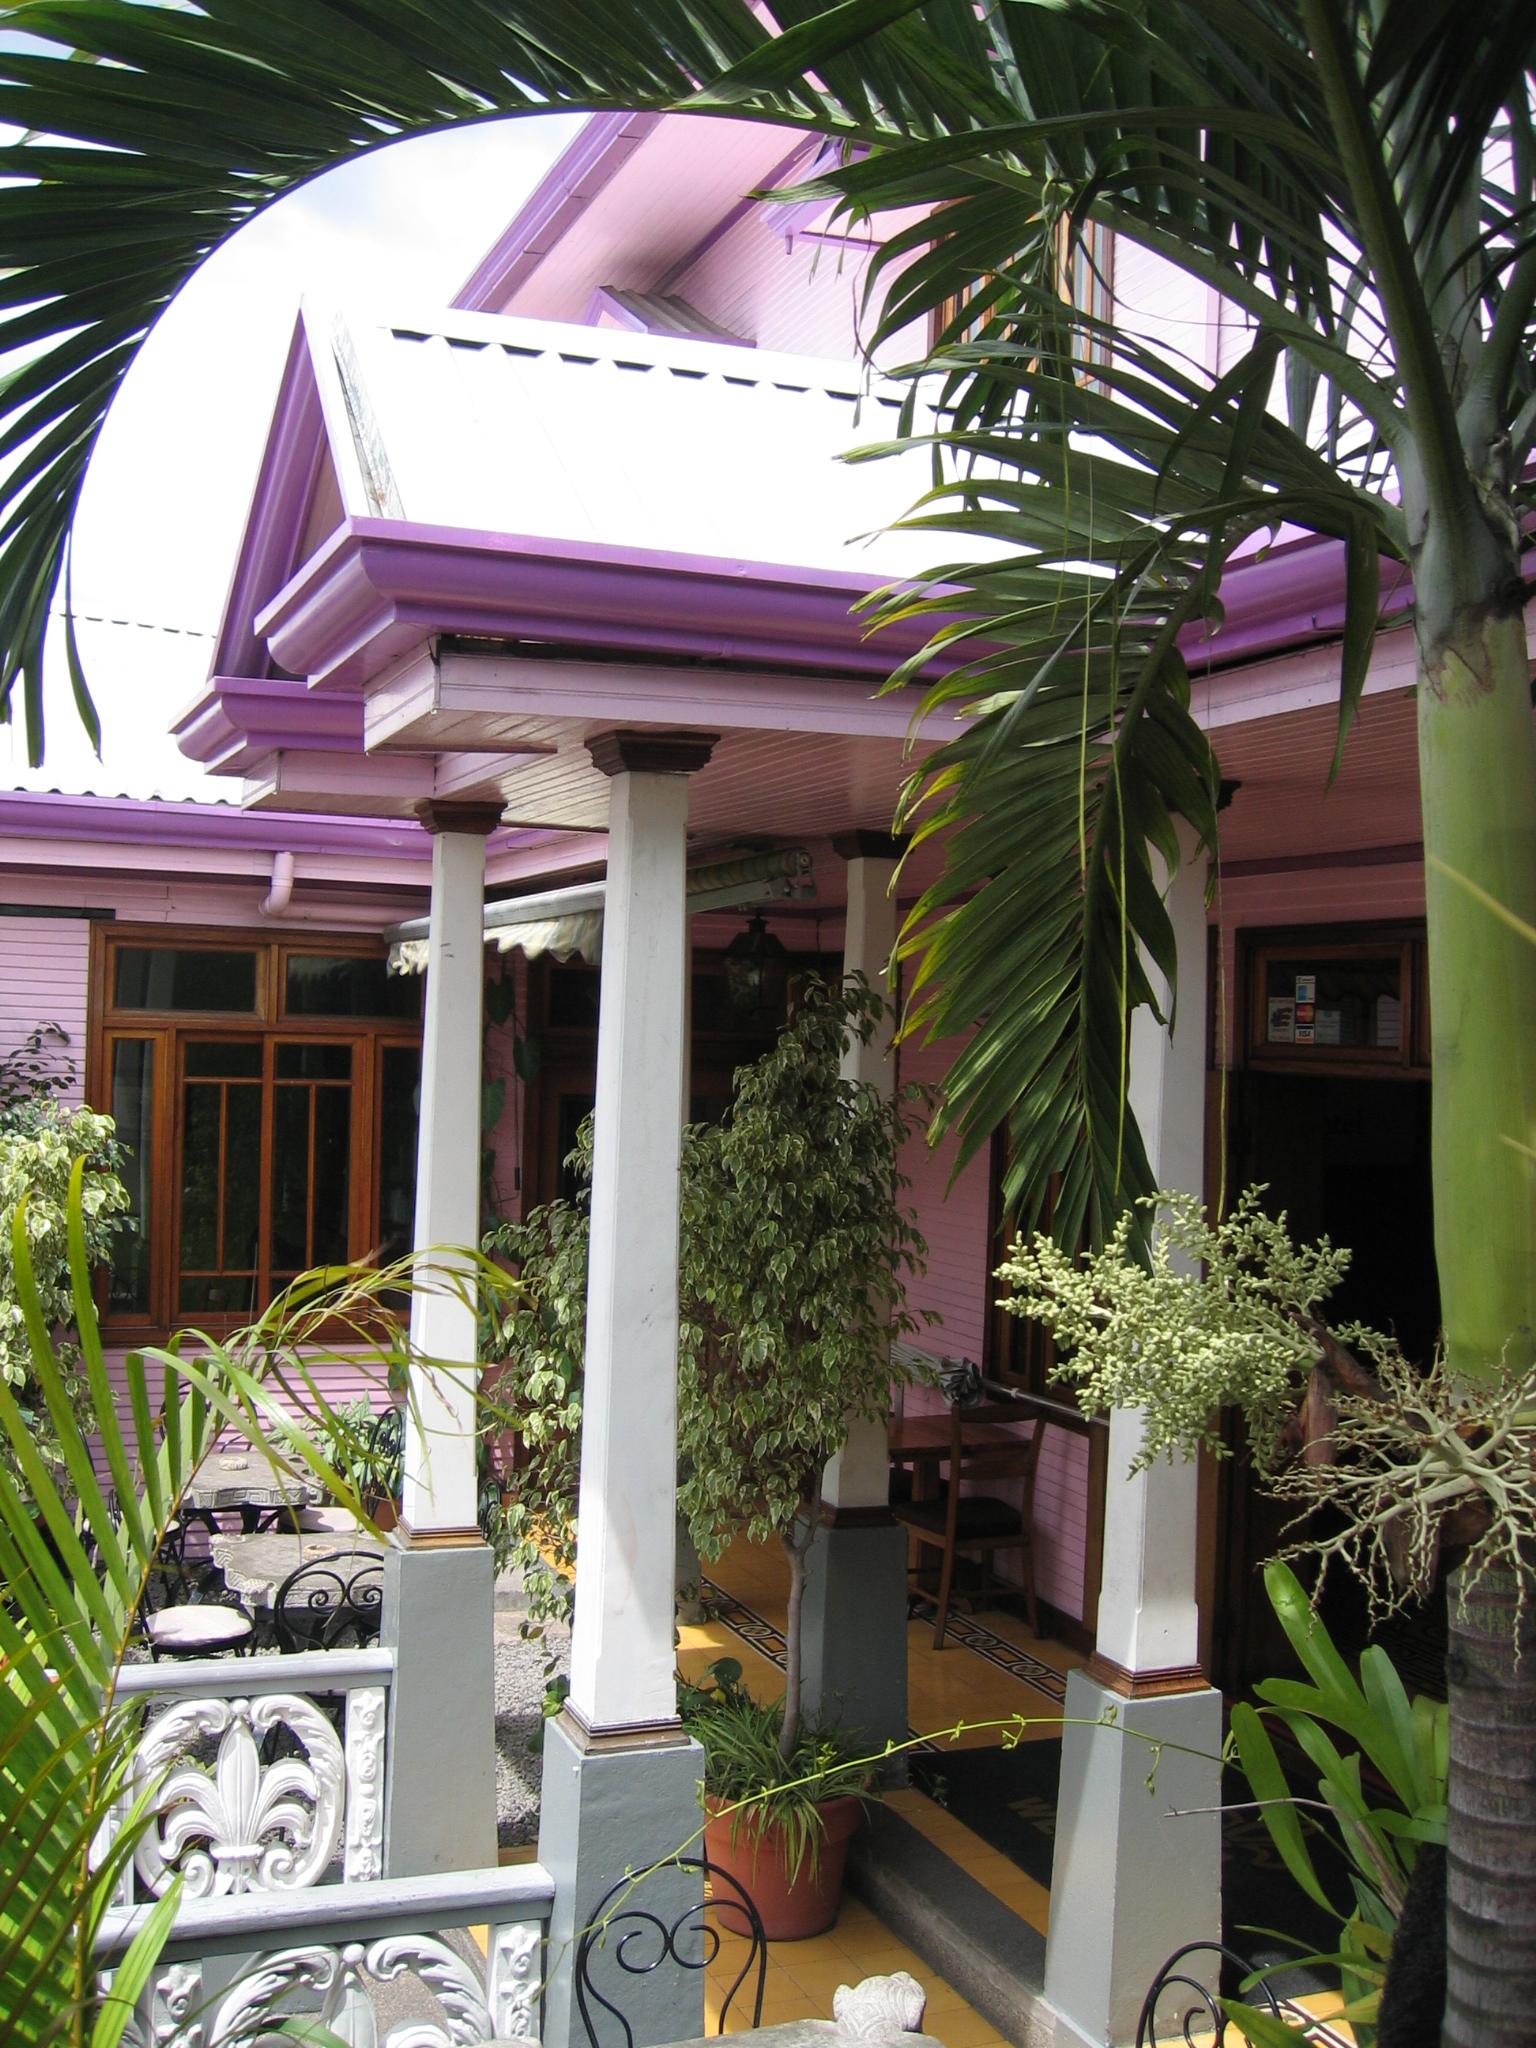 2 jardin hotel fleur de lys spanish costa rica guides for Hotel jardin de fleurs kyoto